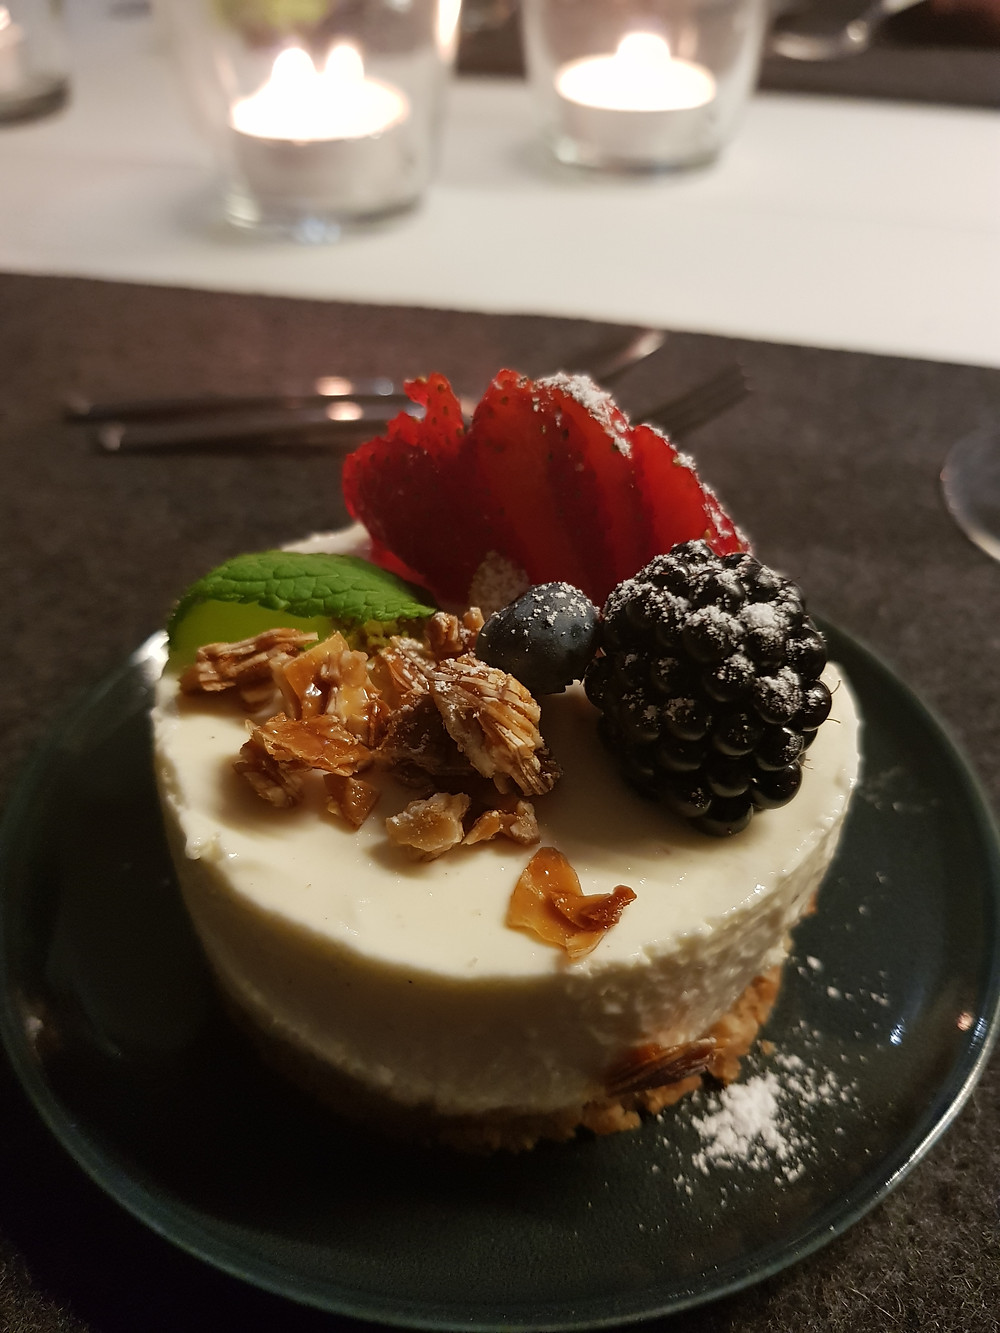 Rezept, Dessert, Hobbyköchin, Beeren, Quarksahnetörtchen